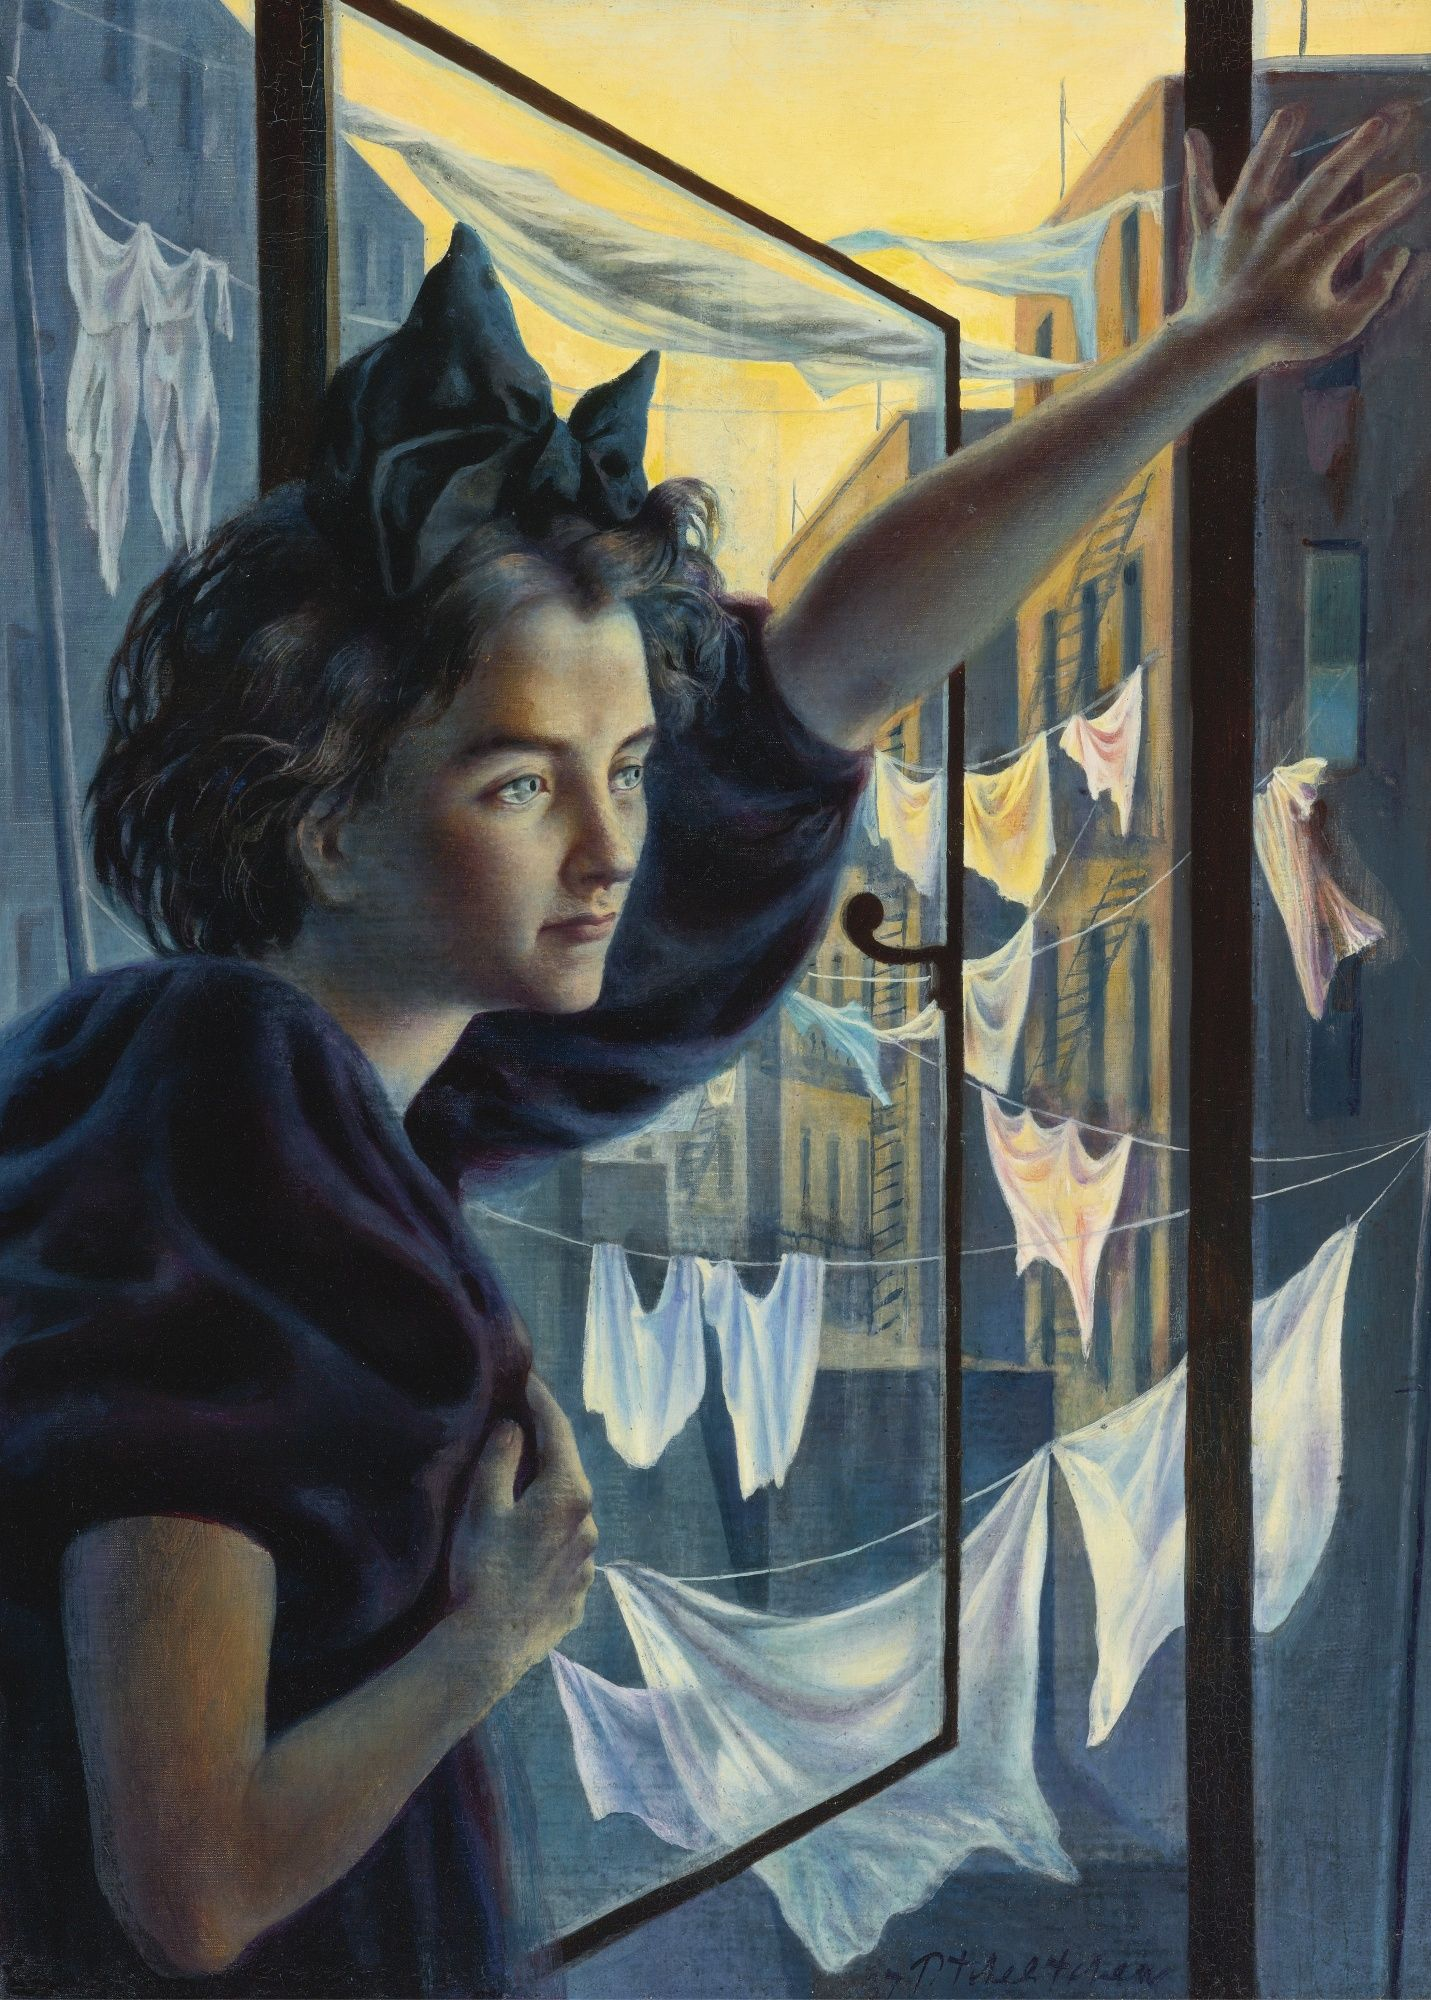 Pavel Tchelitchew Lot Sotheby's Artist, Art, Russian art